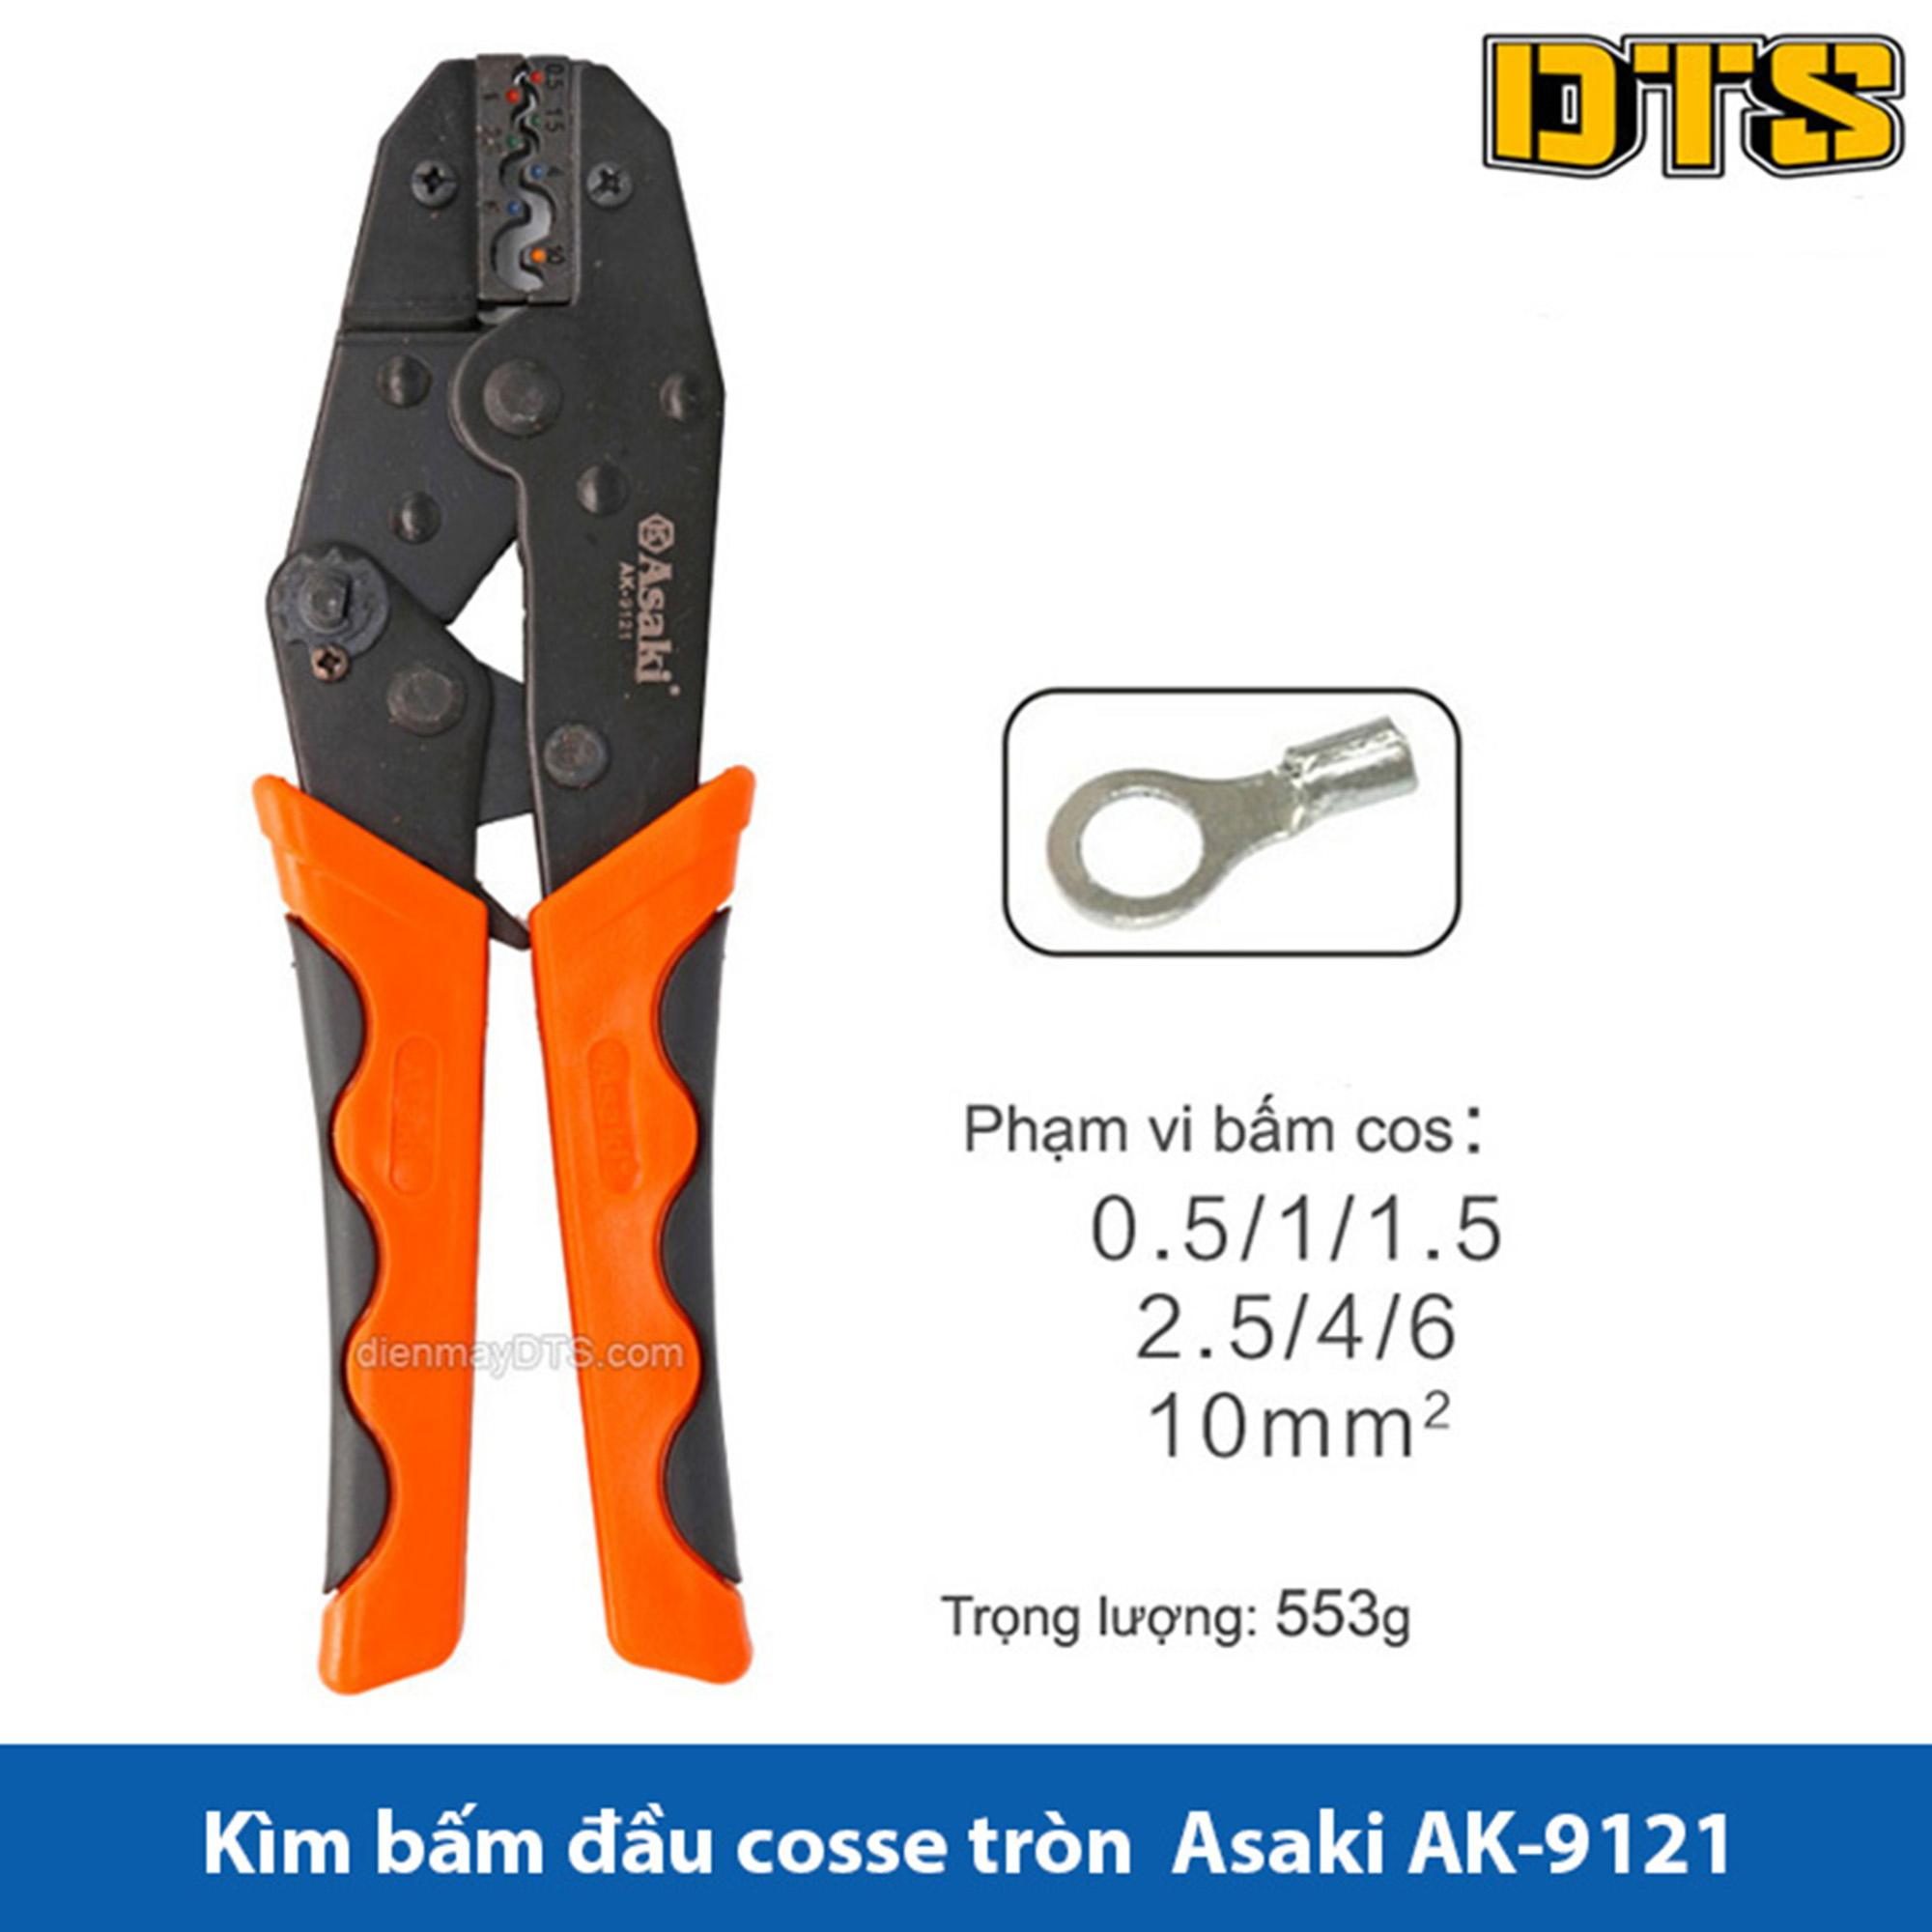 Kìm bấm cos tròn Asaki AK-9121 0.5 ~ 10mm2 - Kềm bấm cốt tròn, Kìm bấm đầu cosse Asaki (Kìm bấm đầu cote Asaki)